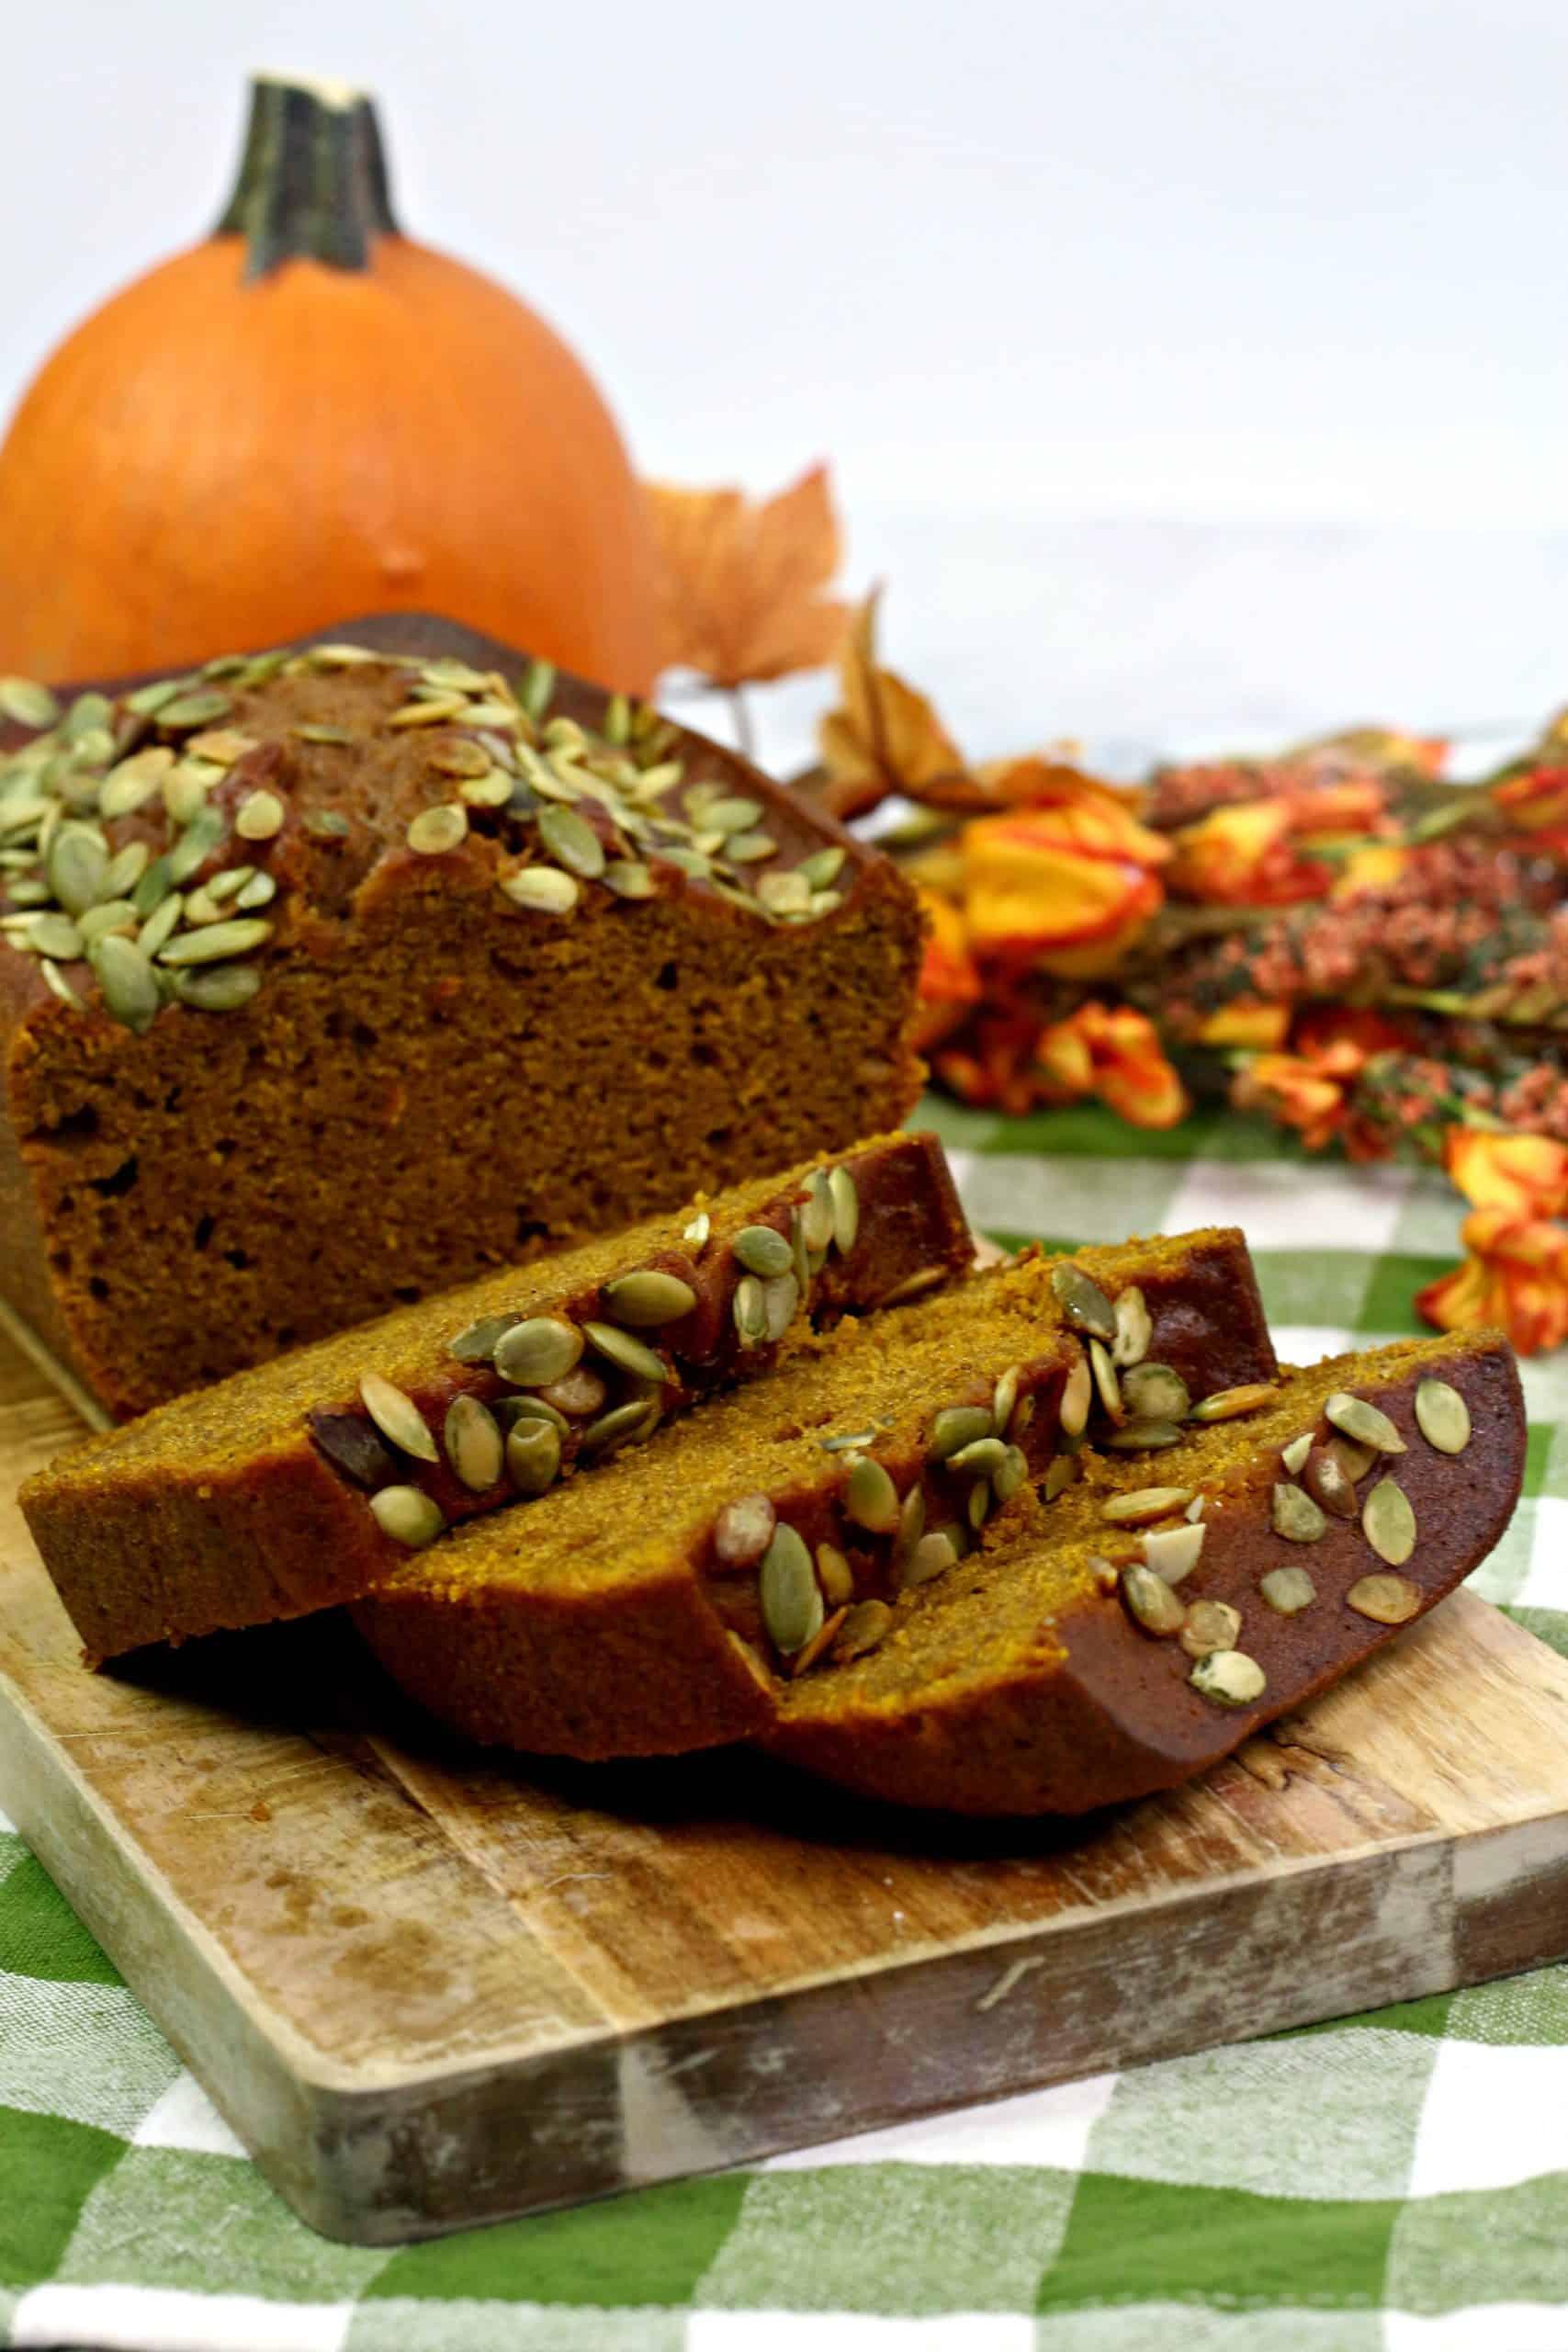 Pumpkin Loaf on table